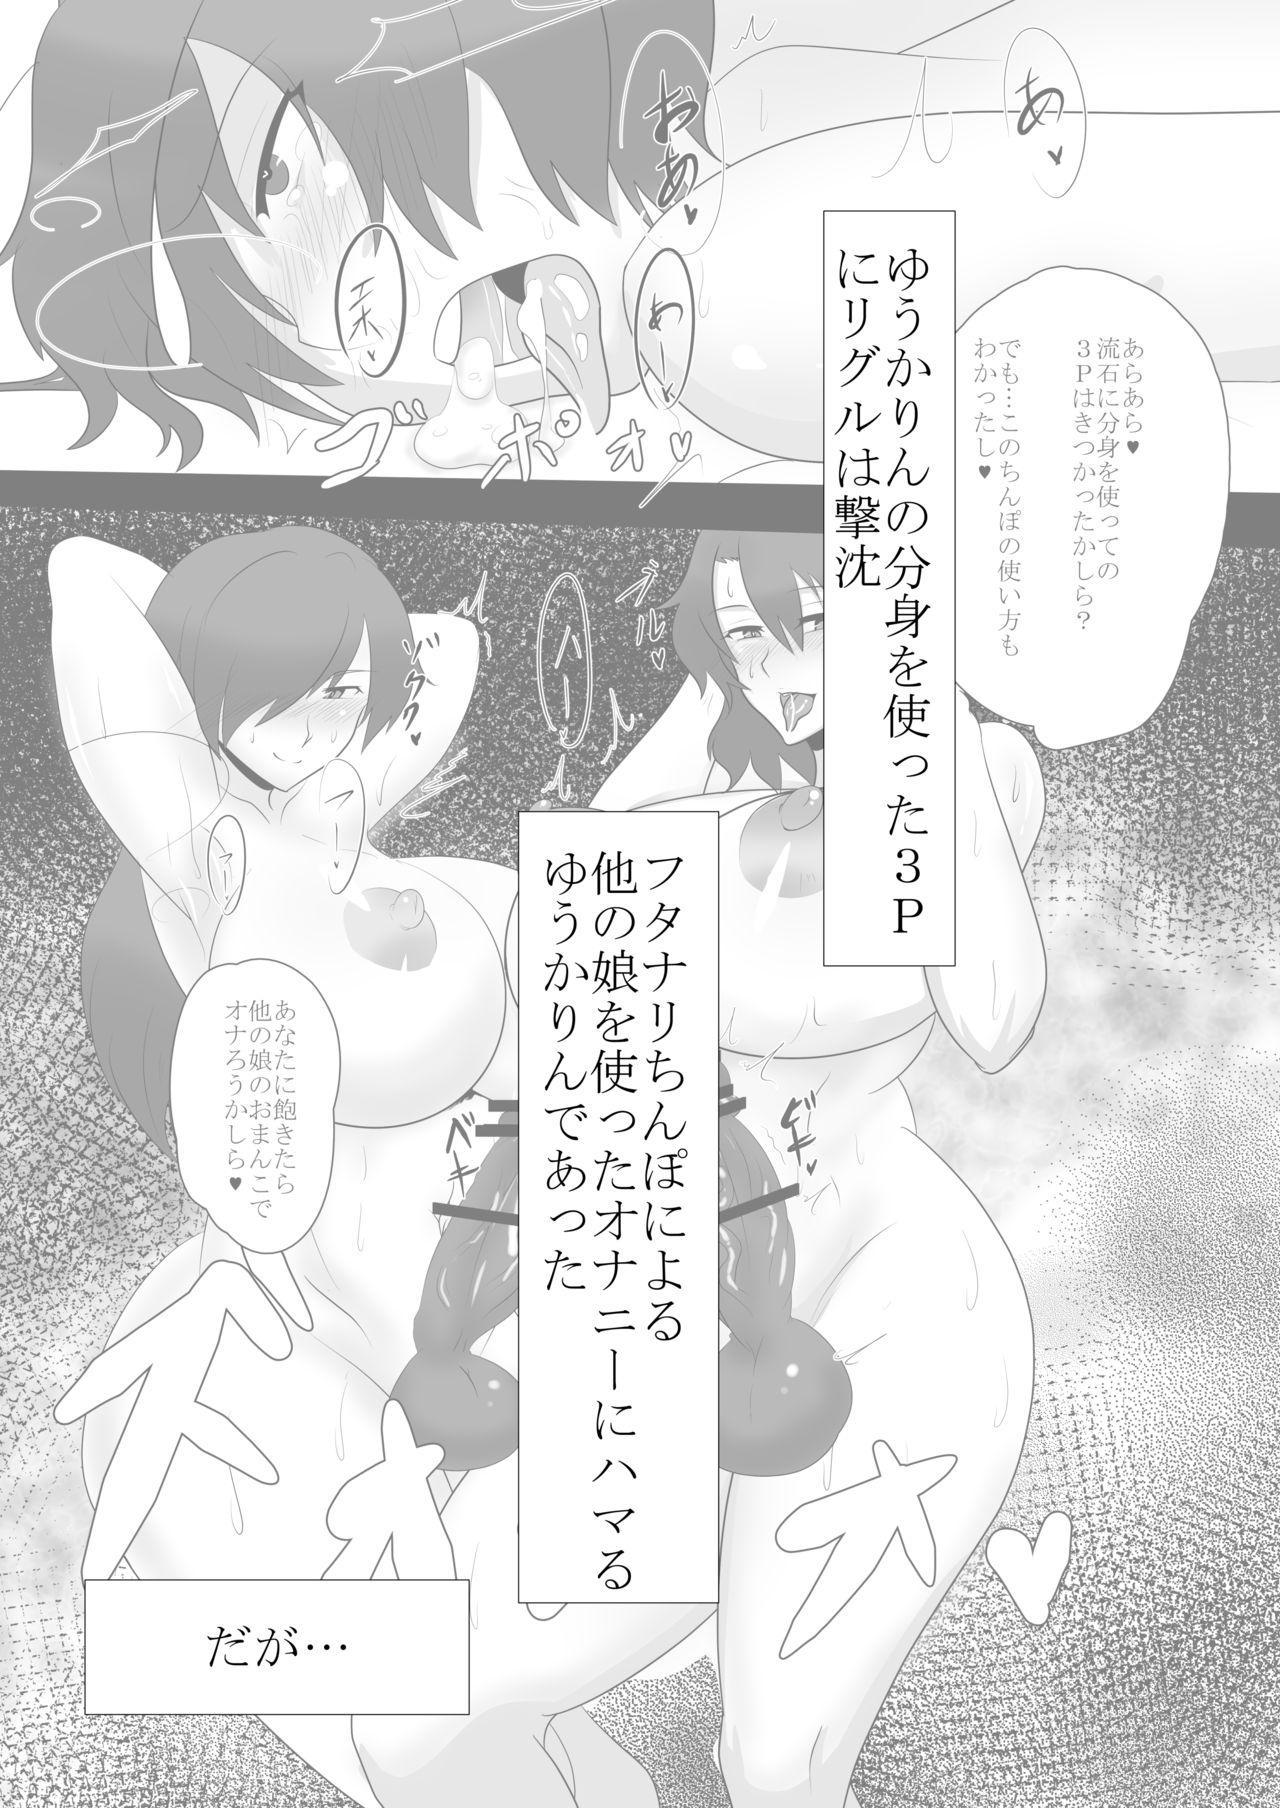 [Black_Sugar(Kari) (Kuroi Megane)] Touhou Futabusa ~Kazami Yuuka~ 2 (Touhou Project) [Digital] 4